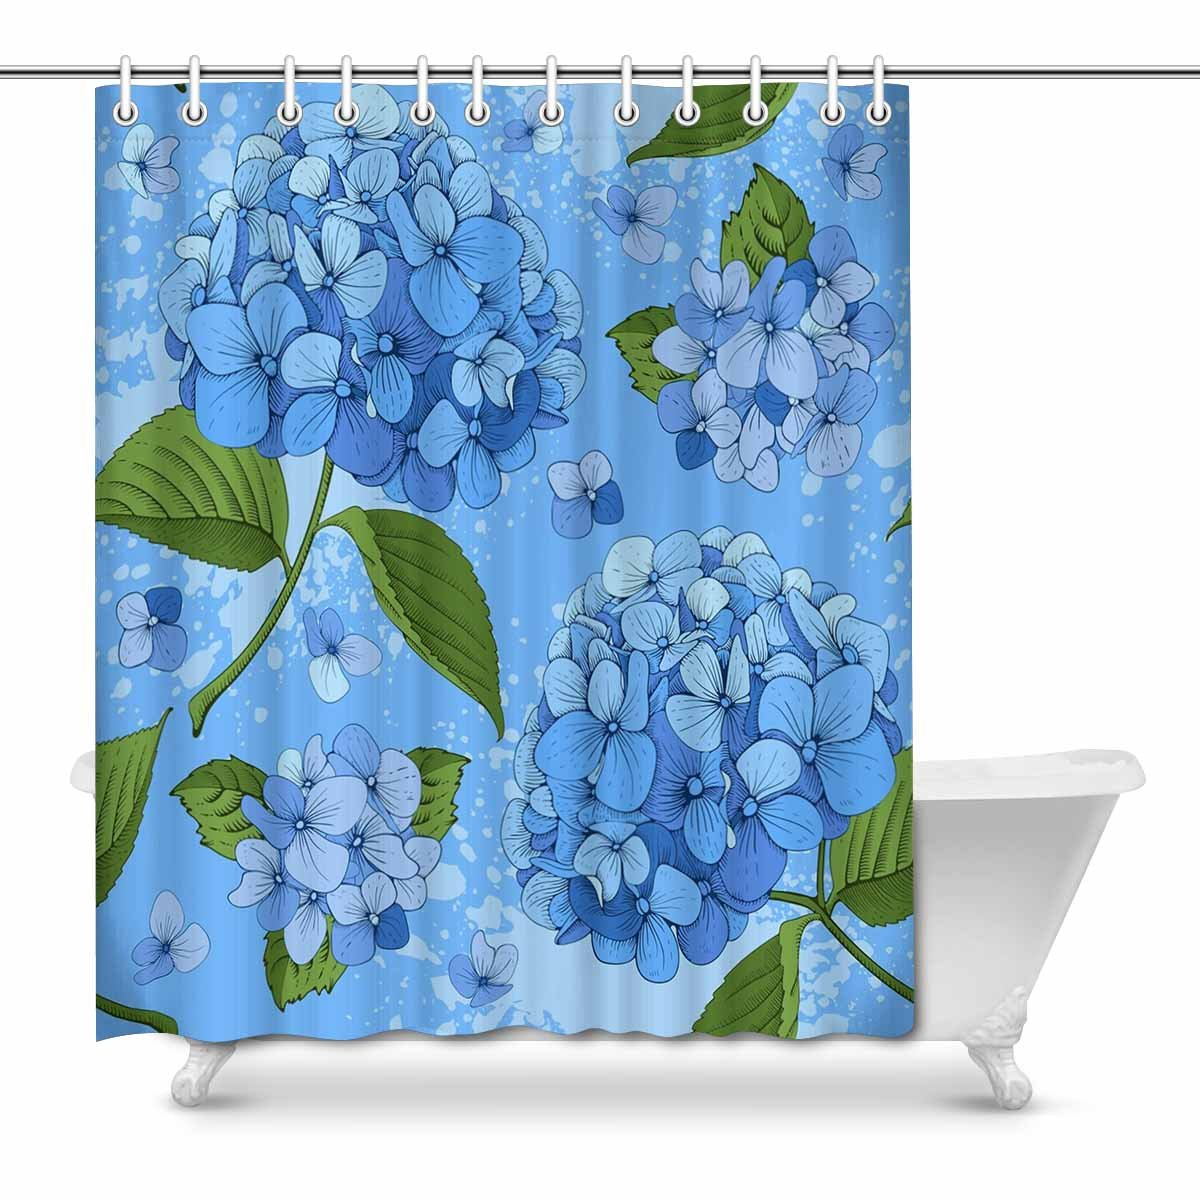 Pop Luxury Blooming Hydrangea Bathroom Shower Curtain 66x72